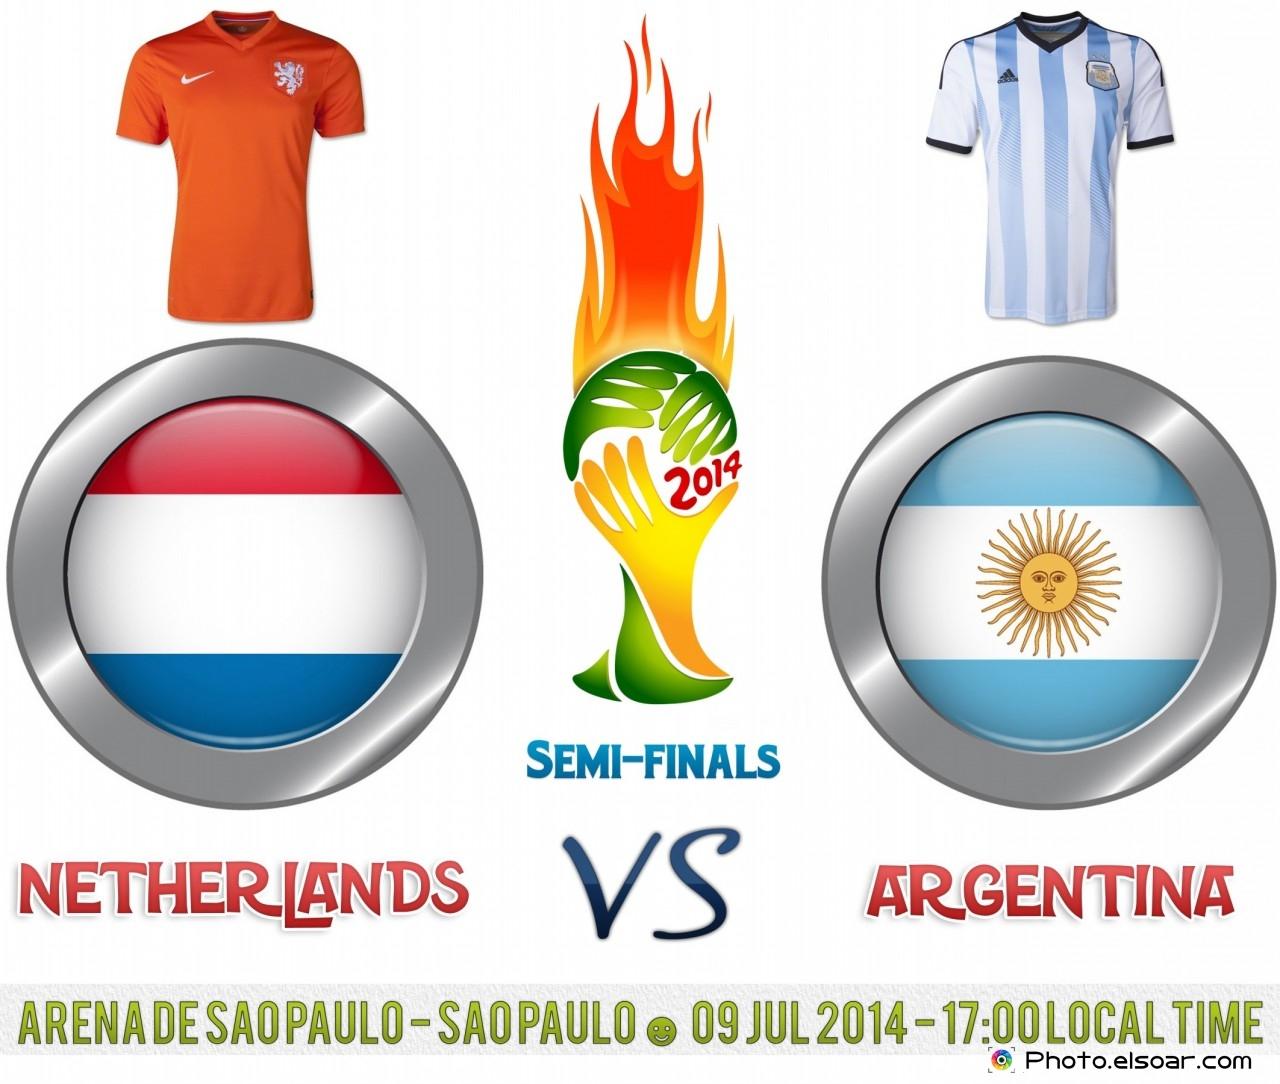 Netherlands Vs Argentina Semi-finals Match - World Cup 2014 - Arena de Sao Paulo - Sao Paulo || 09 Jul 2014 - 17:00 Local time